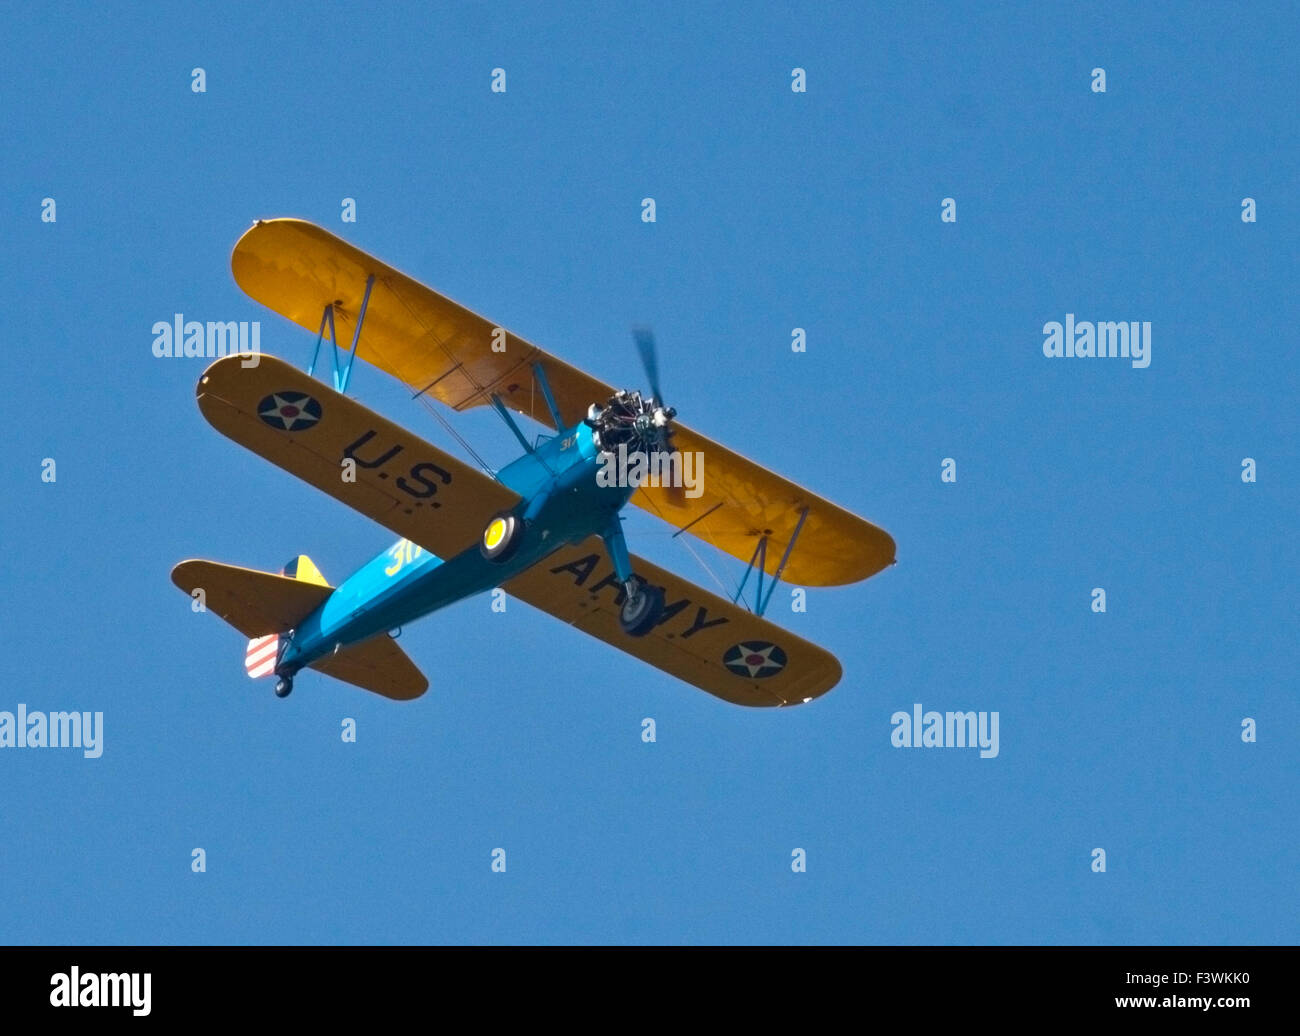 US Army Biplane, UK - Stock Image